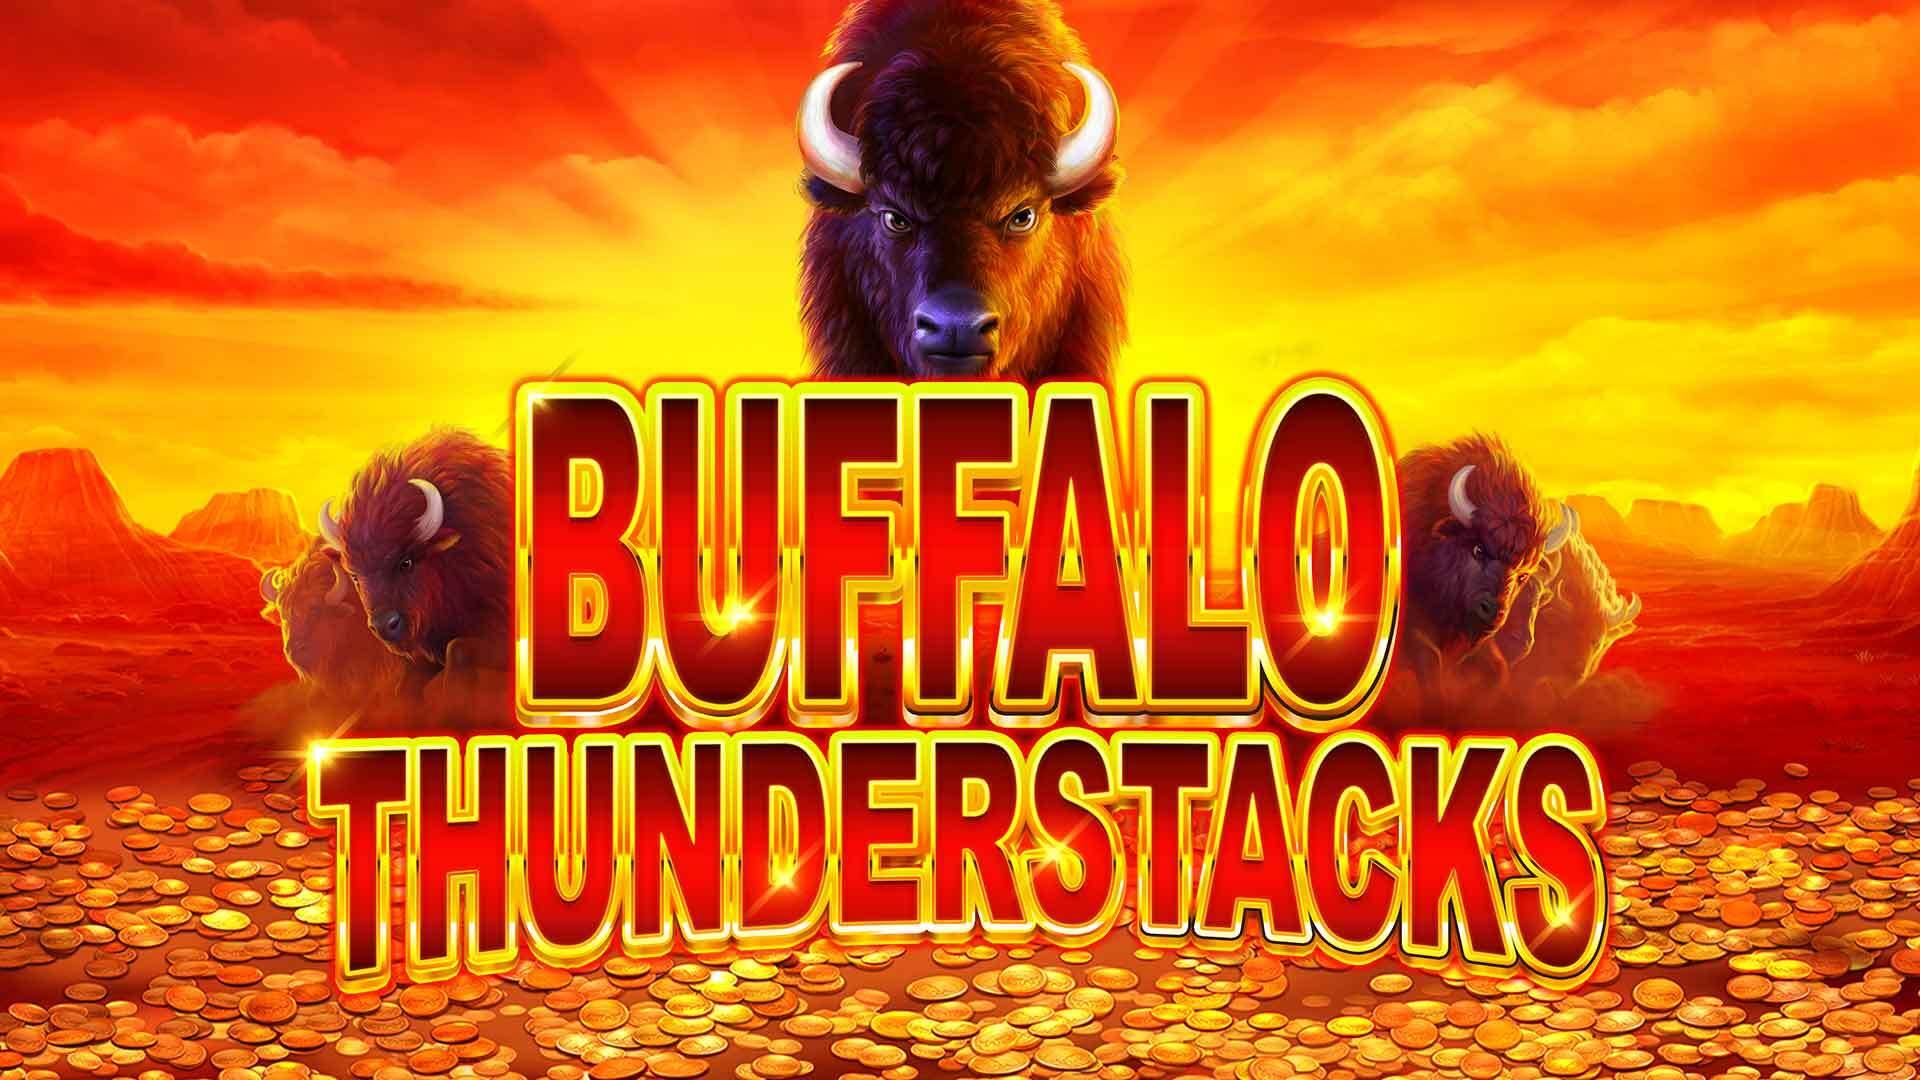 nserve---buffalo-thunderstakes-1920x1080